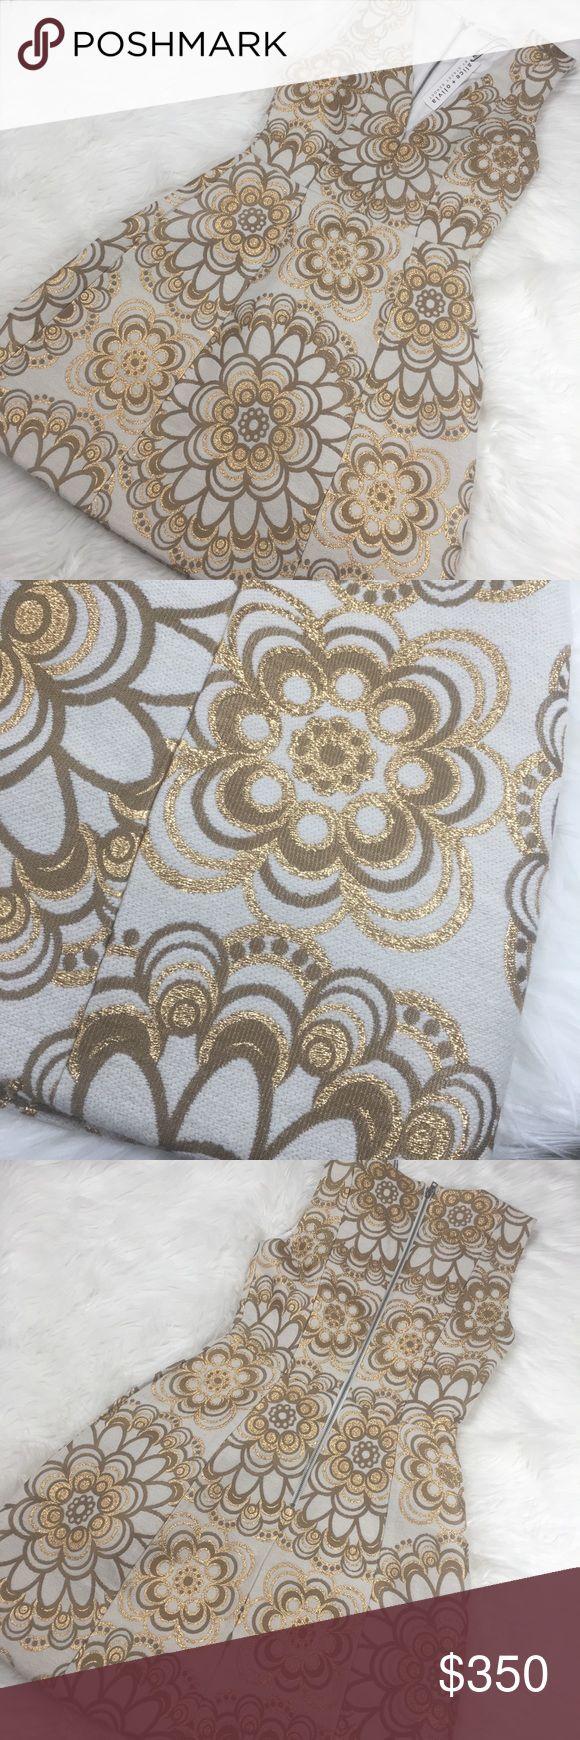 "Alice + Olivia Mandala Deep V-Neck Brocade Dress NEW WITH TAGS!!! Mandala deep v-neck cream gold brocade dress Size: 0 Length: 32.5"" Underarm to Underarm: 15.5"" Material: Acrylic/Acetate/Wool/Polyester/Nylon Alice + Olivia Dresses"